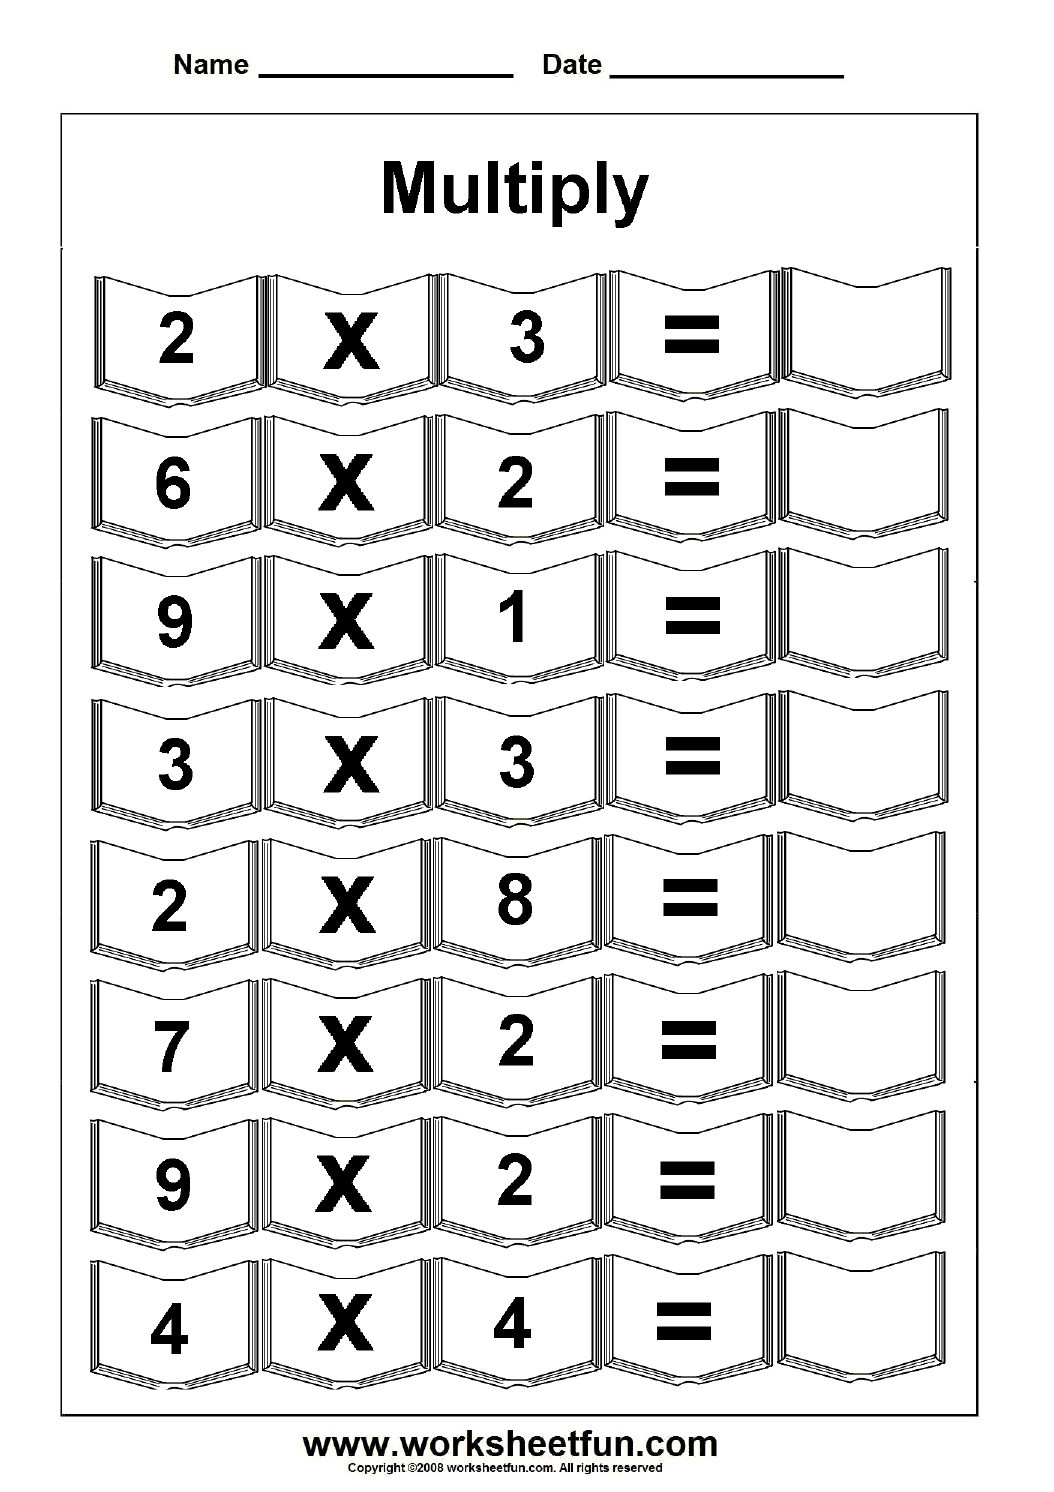 Multiplication – 5 Worksheets / Free Printable Worksheets – Worksheetfun - Free Printable Worksheets